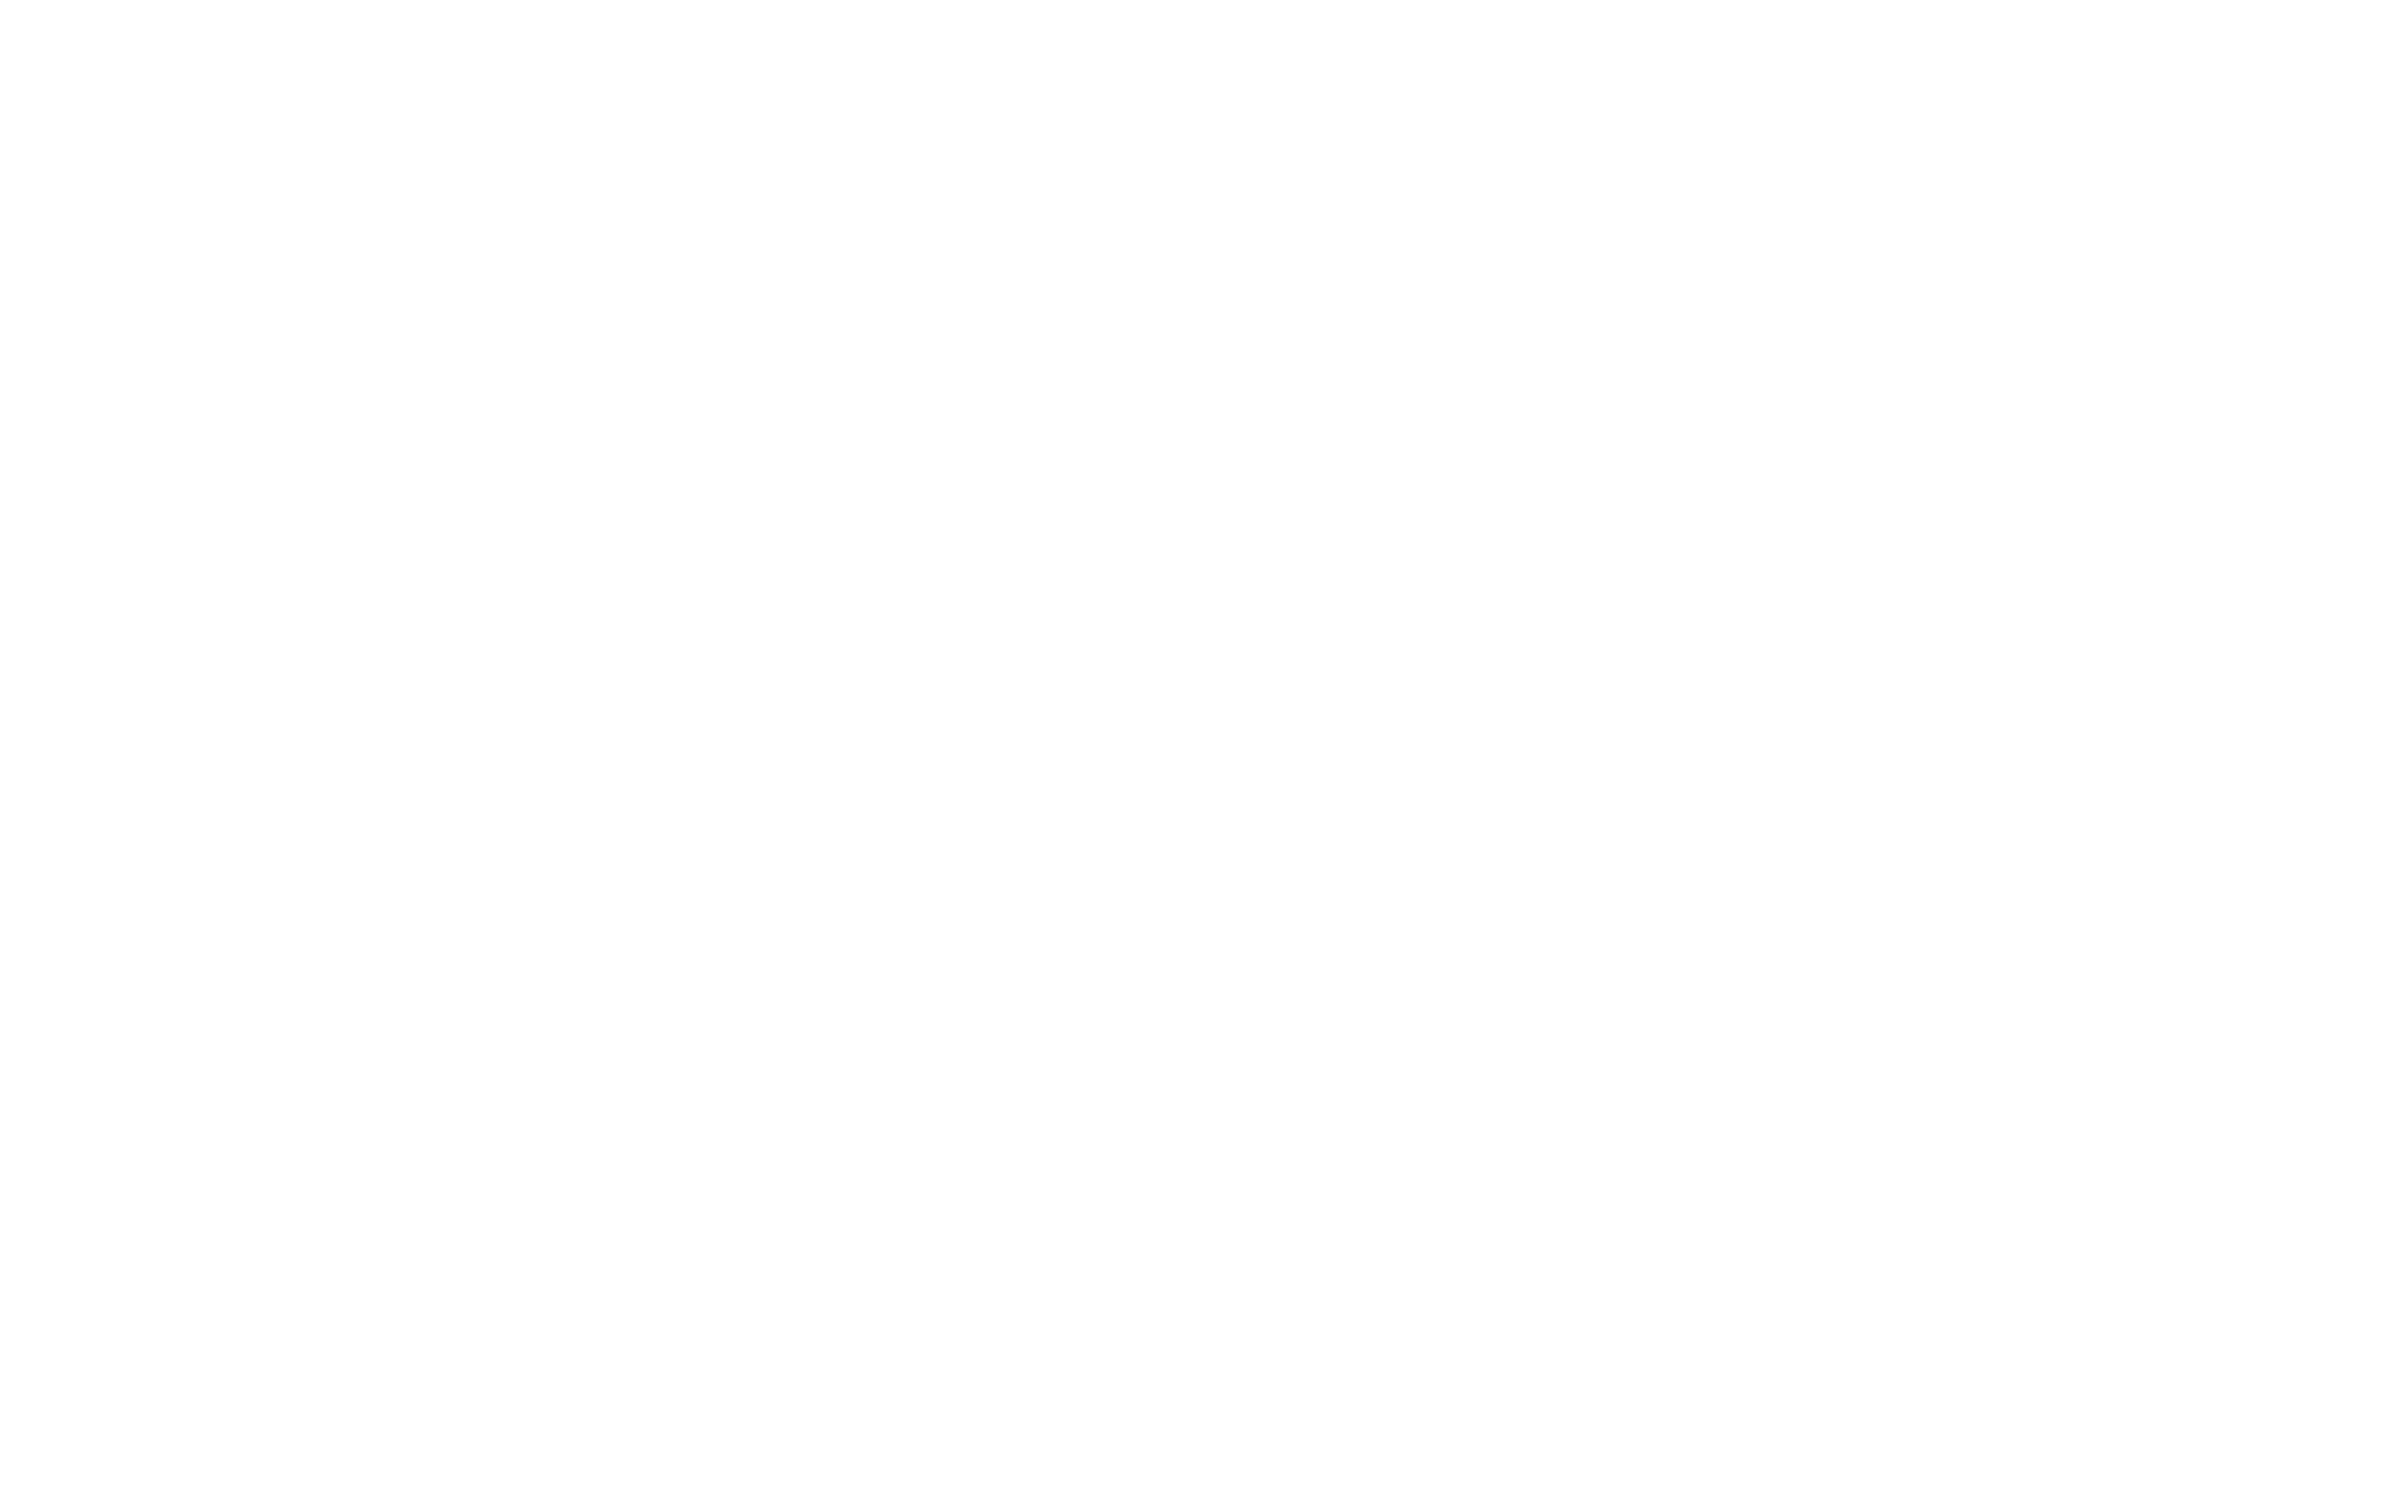 mira_RGB_Reverse